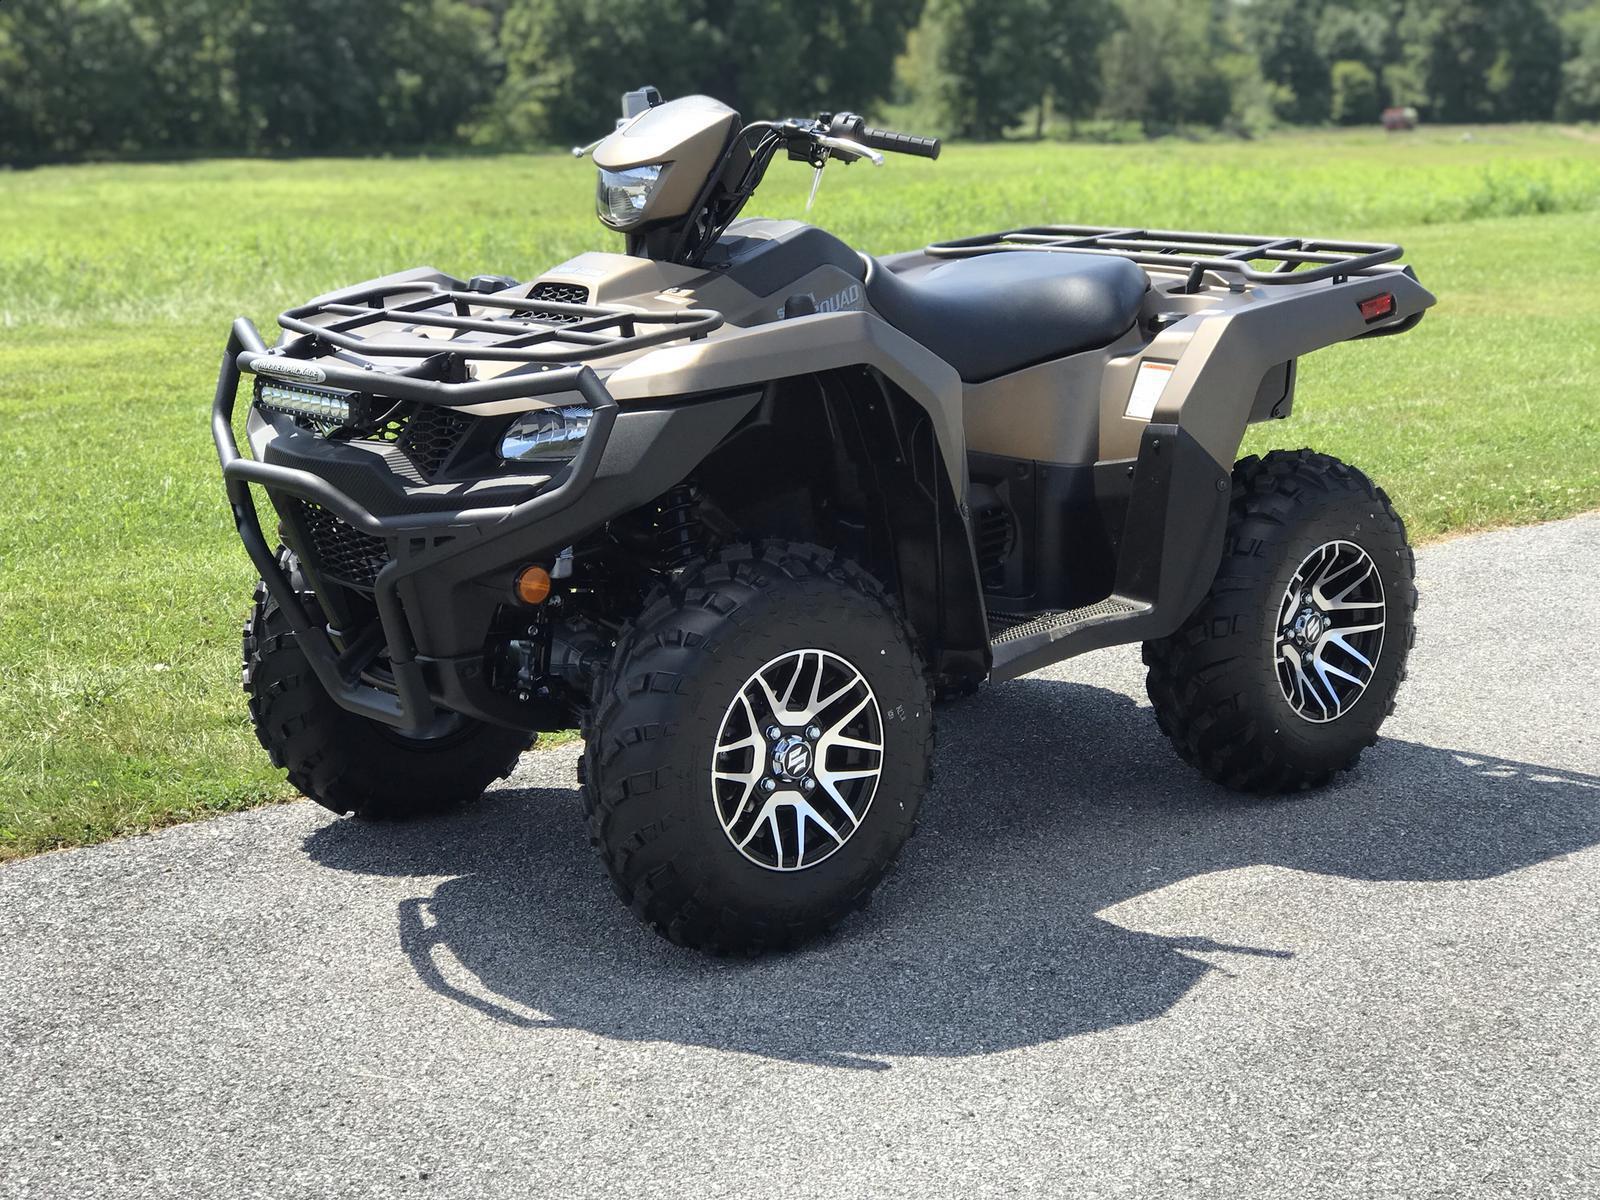 Inventory Offroad Motorsports & Cycle Sales Jonestown, PA